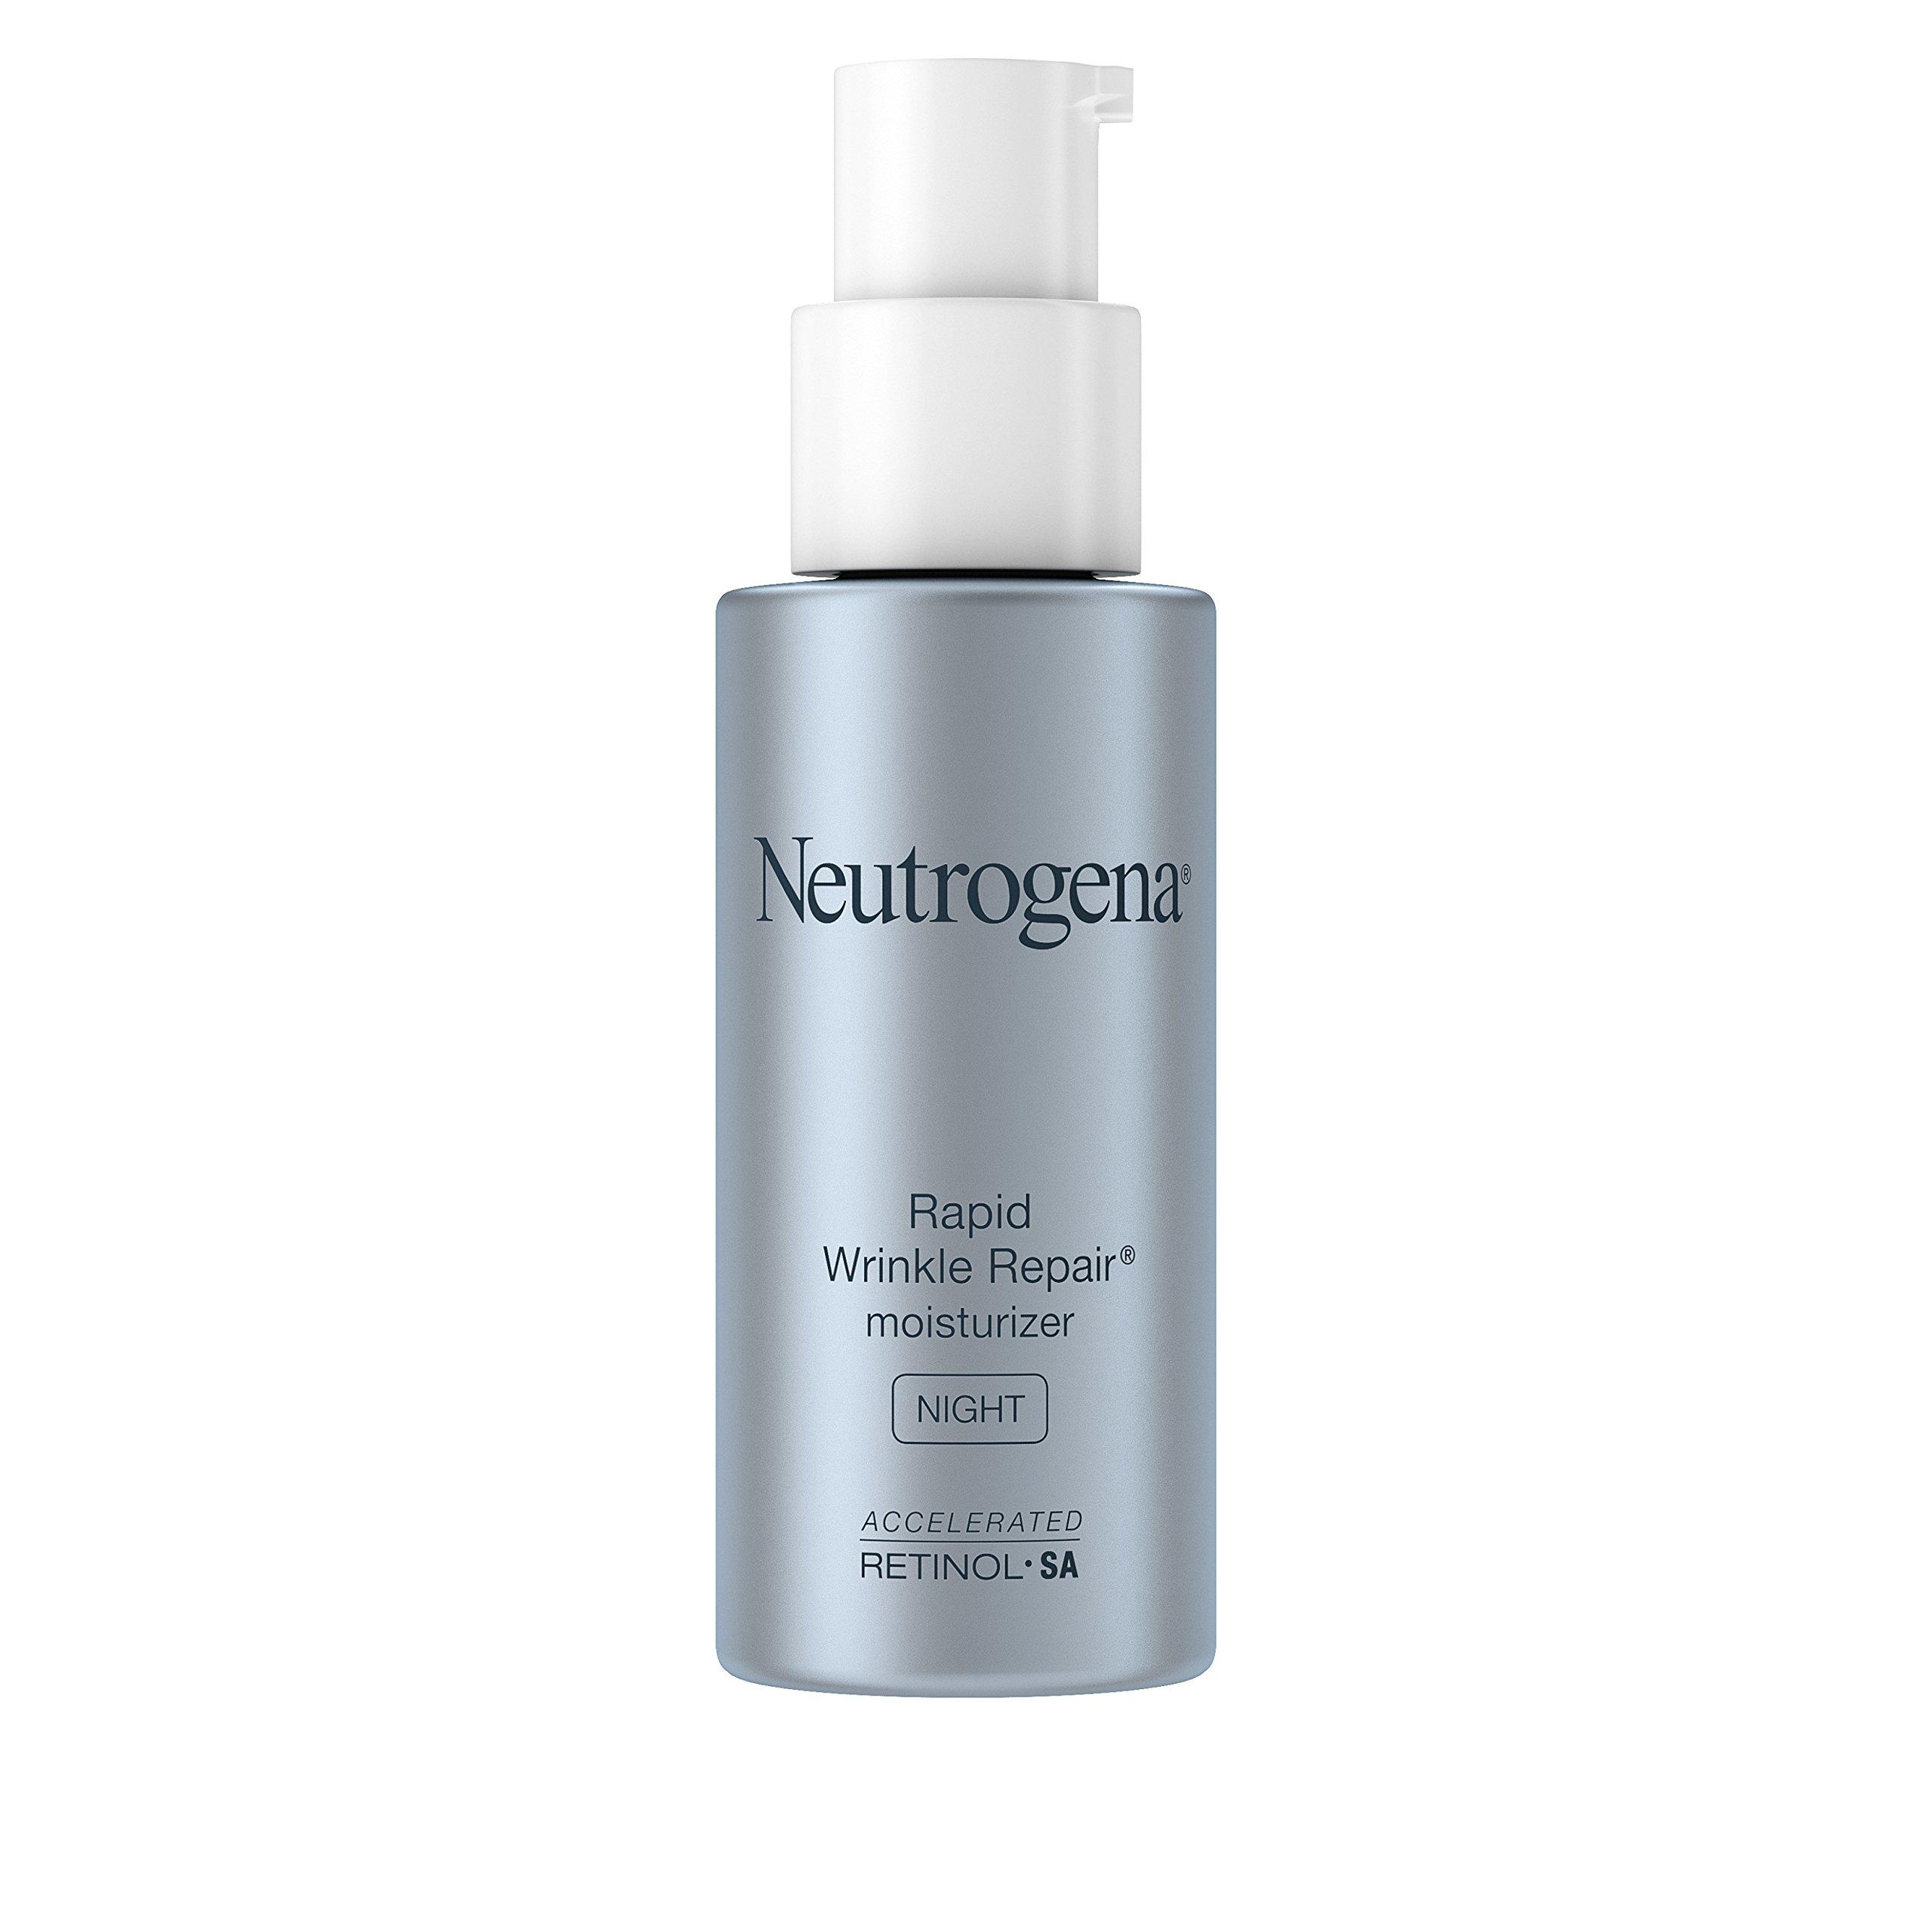 Neutrogena Rapid Wrinkle Repair Accelerated Hyaluronic Acid Retinol Night Cream Face Moisturizer, Anti Wrinkle Face Cream & Neck Cream with Hyaluronic Acid, Retinol & Glycerin, 1 fl. oz by Neutrogena